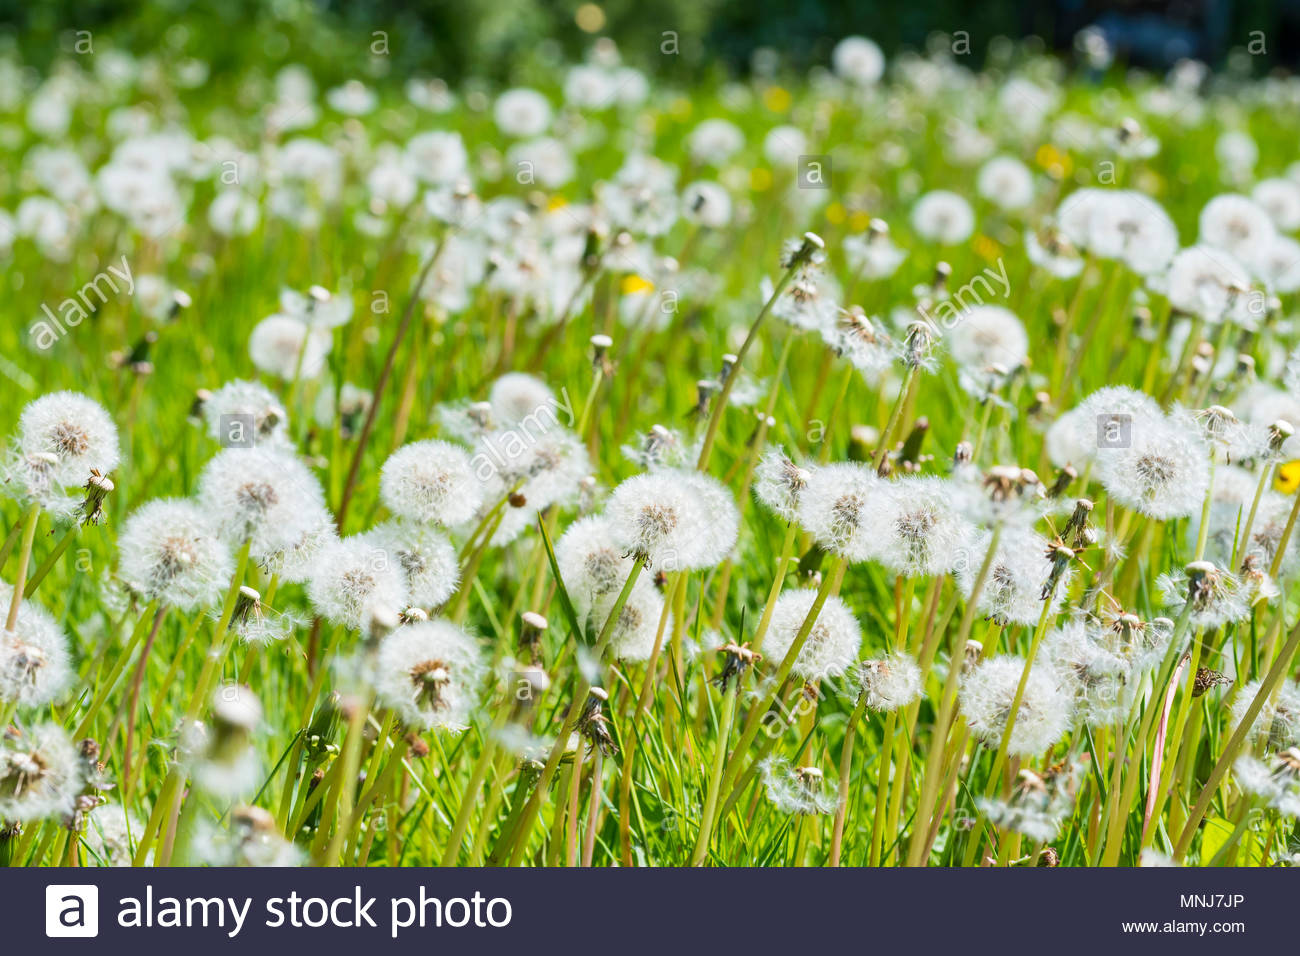 Carpet of white Common Dandelion Seed Heads (Taraxacum), AKA Dandelion Clocks, growing in grassland in late Spring in the UK. - Stock Image